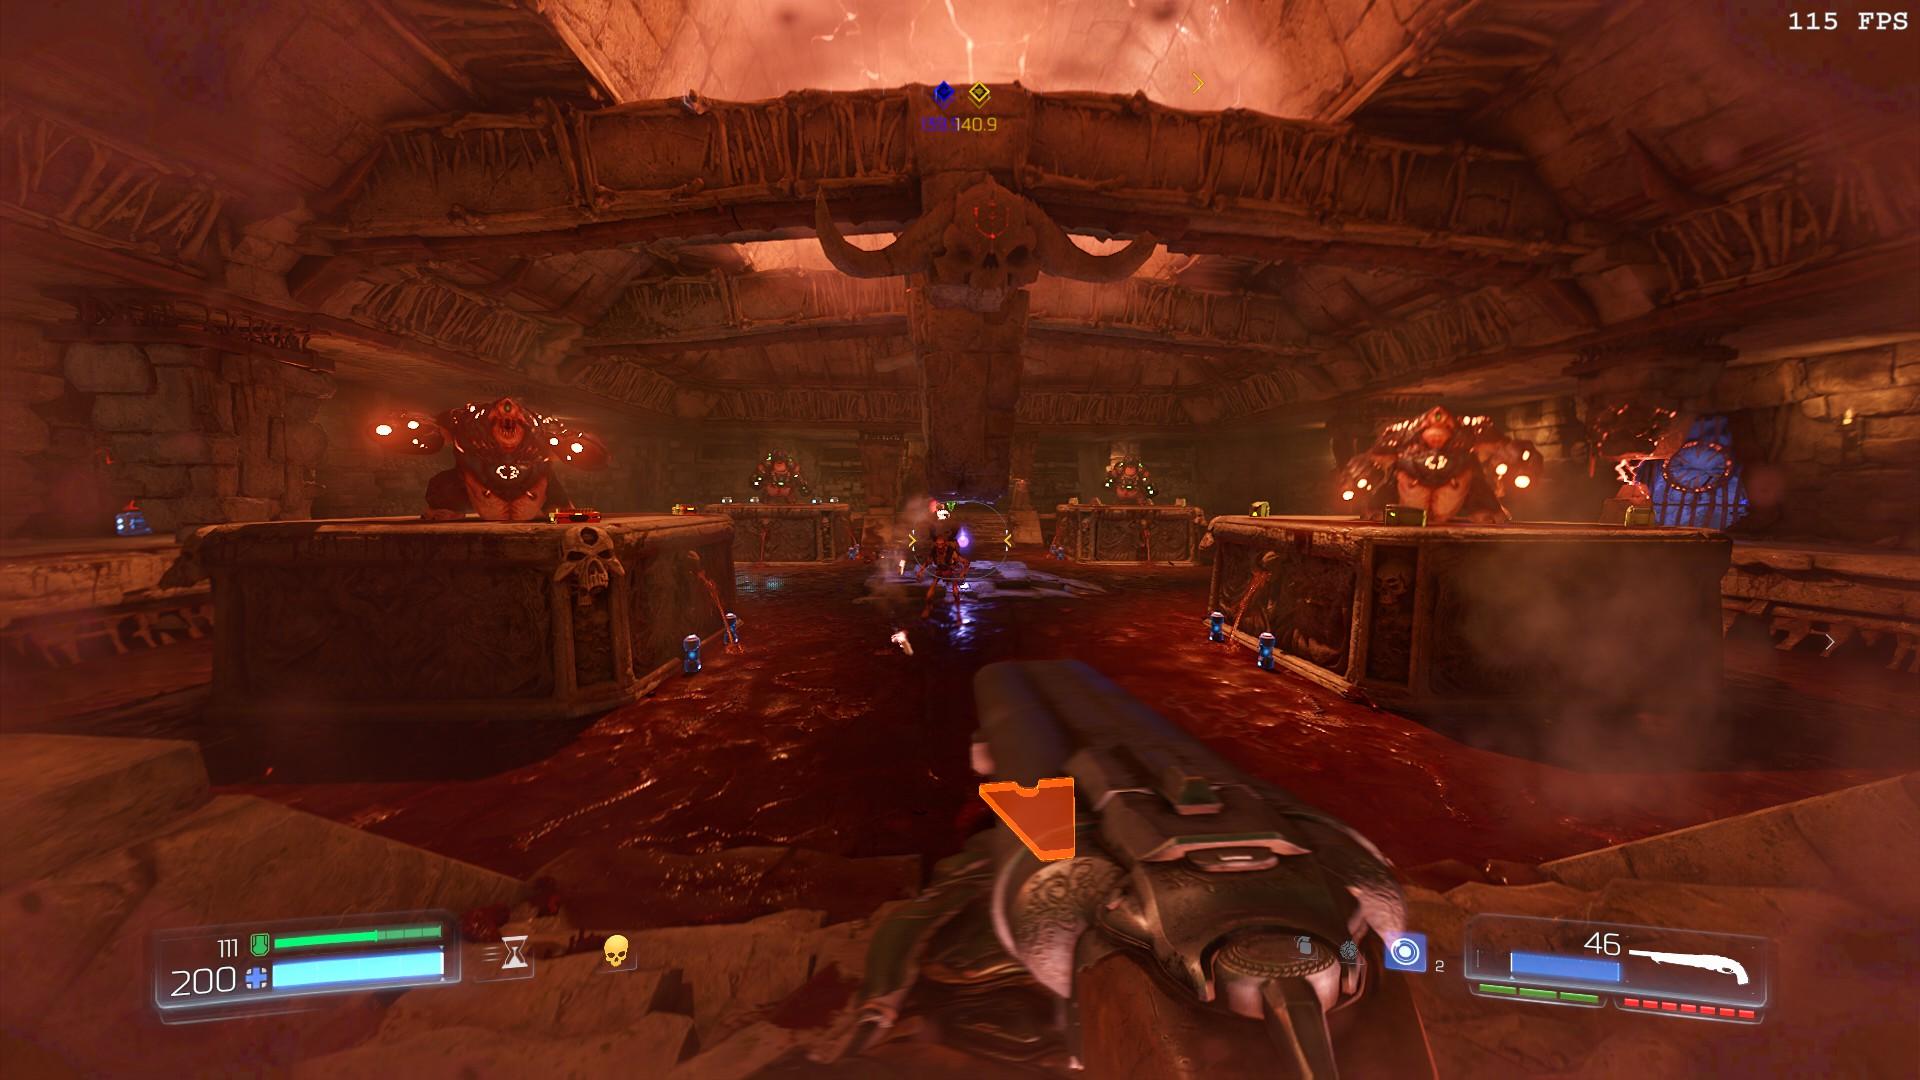 Steam Community :: Guide :: Secret Doom Classic Level